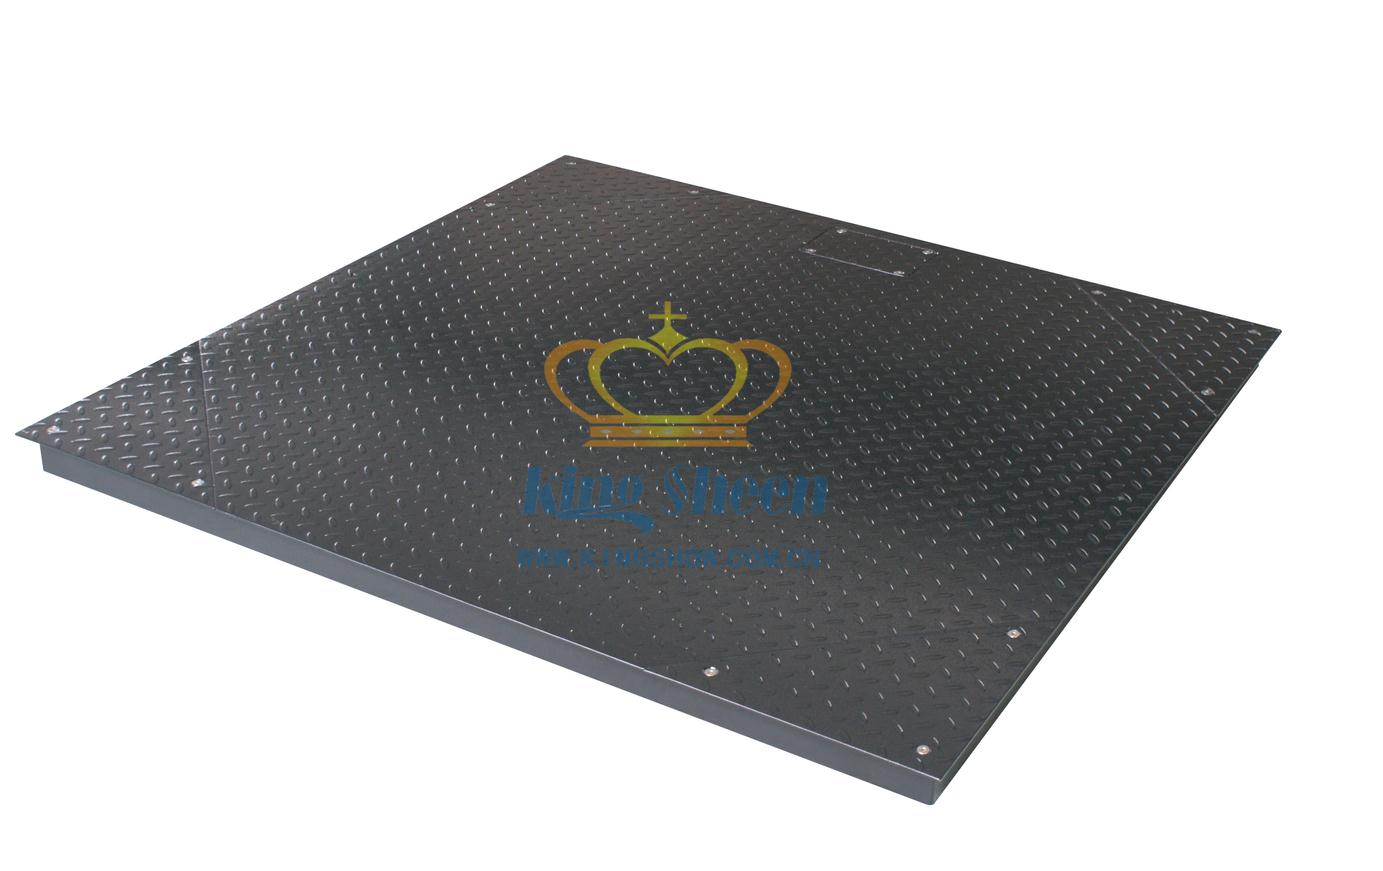 0.8m×1.0m双层电子地磅/碳钢电子磅秤,二吨电子地磅价格